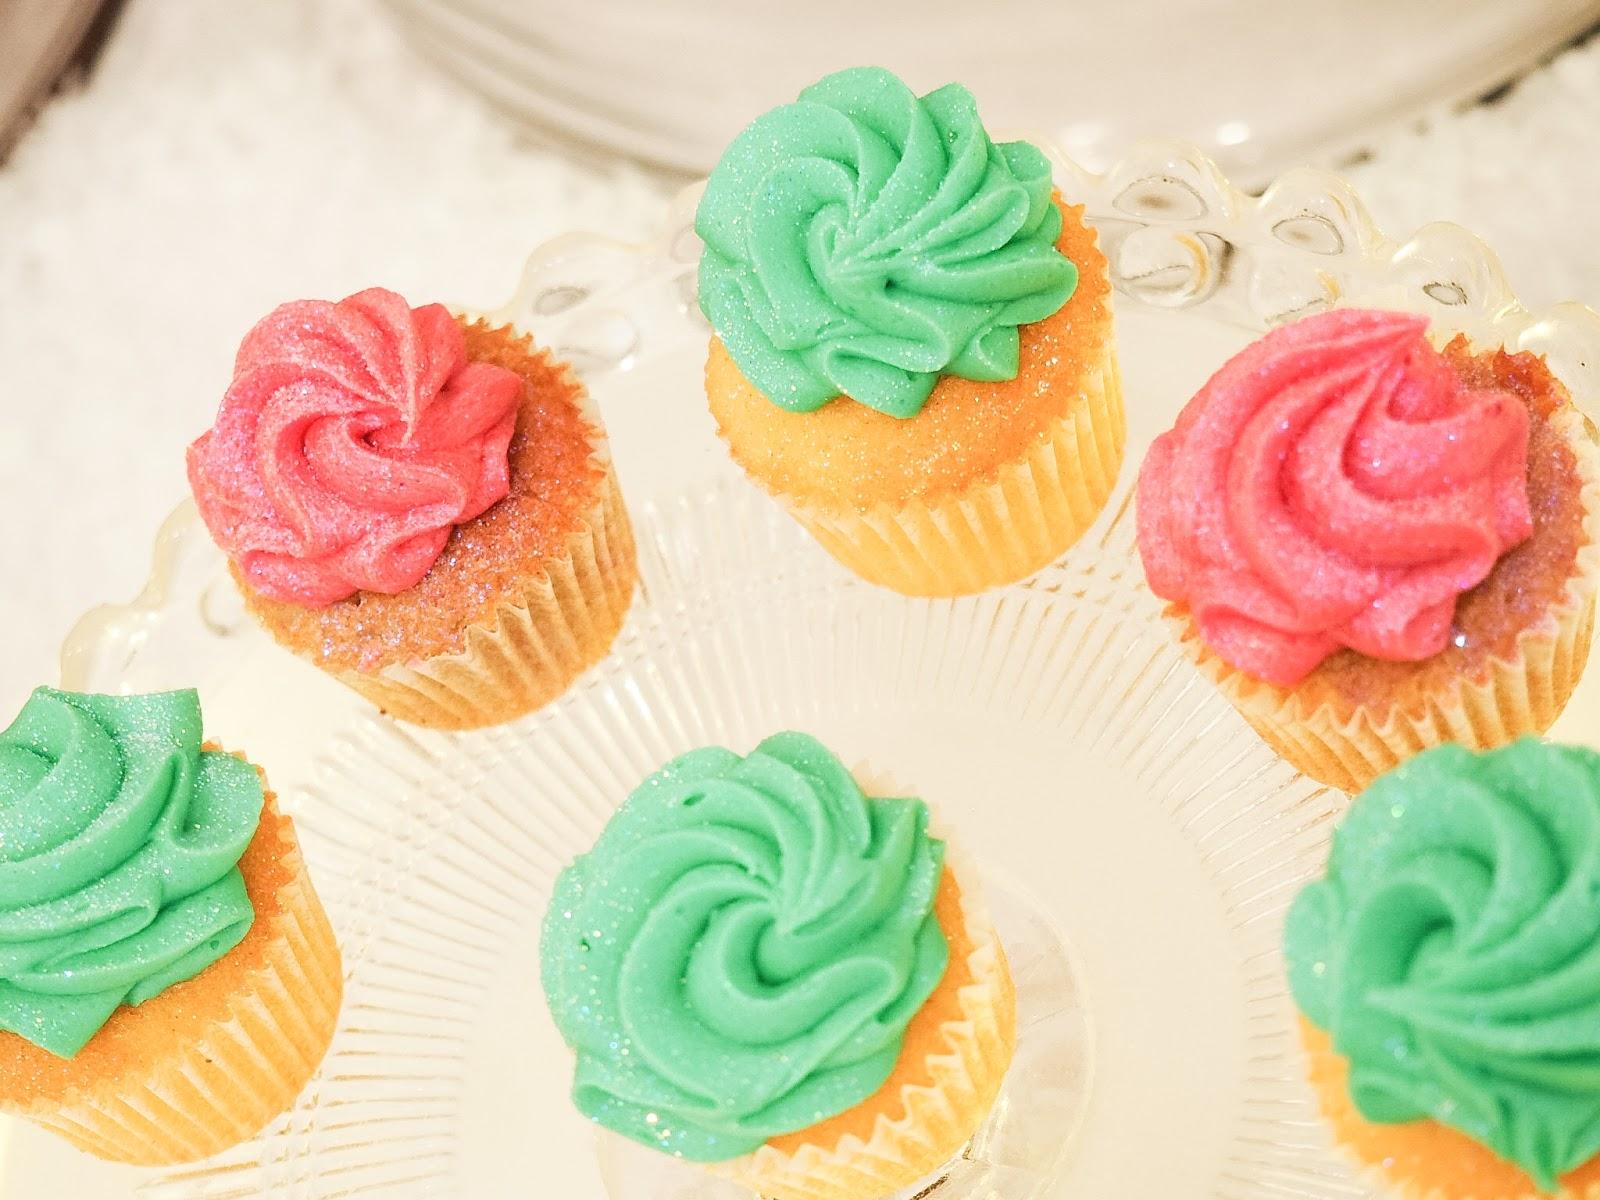 BlogospshereChristmas 2016-2 glitter cupcakes